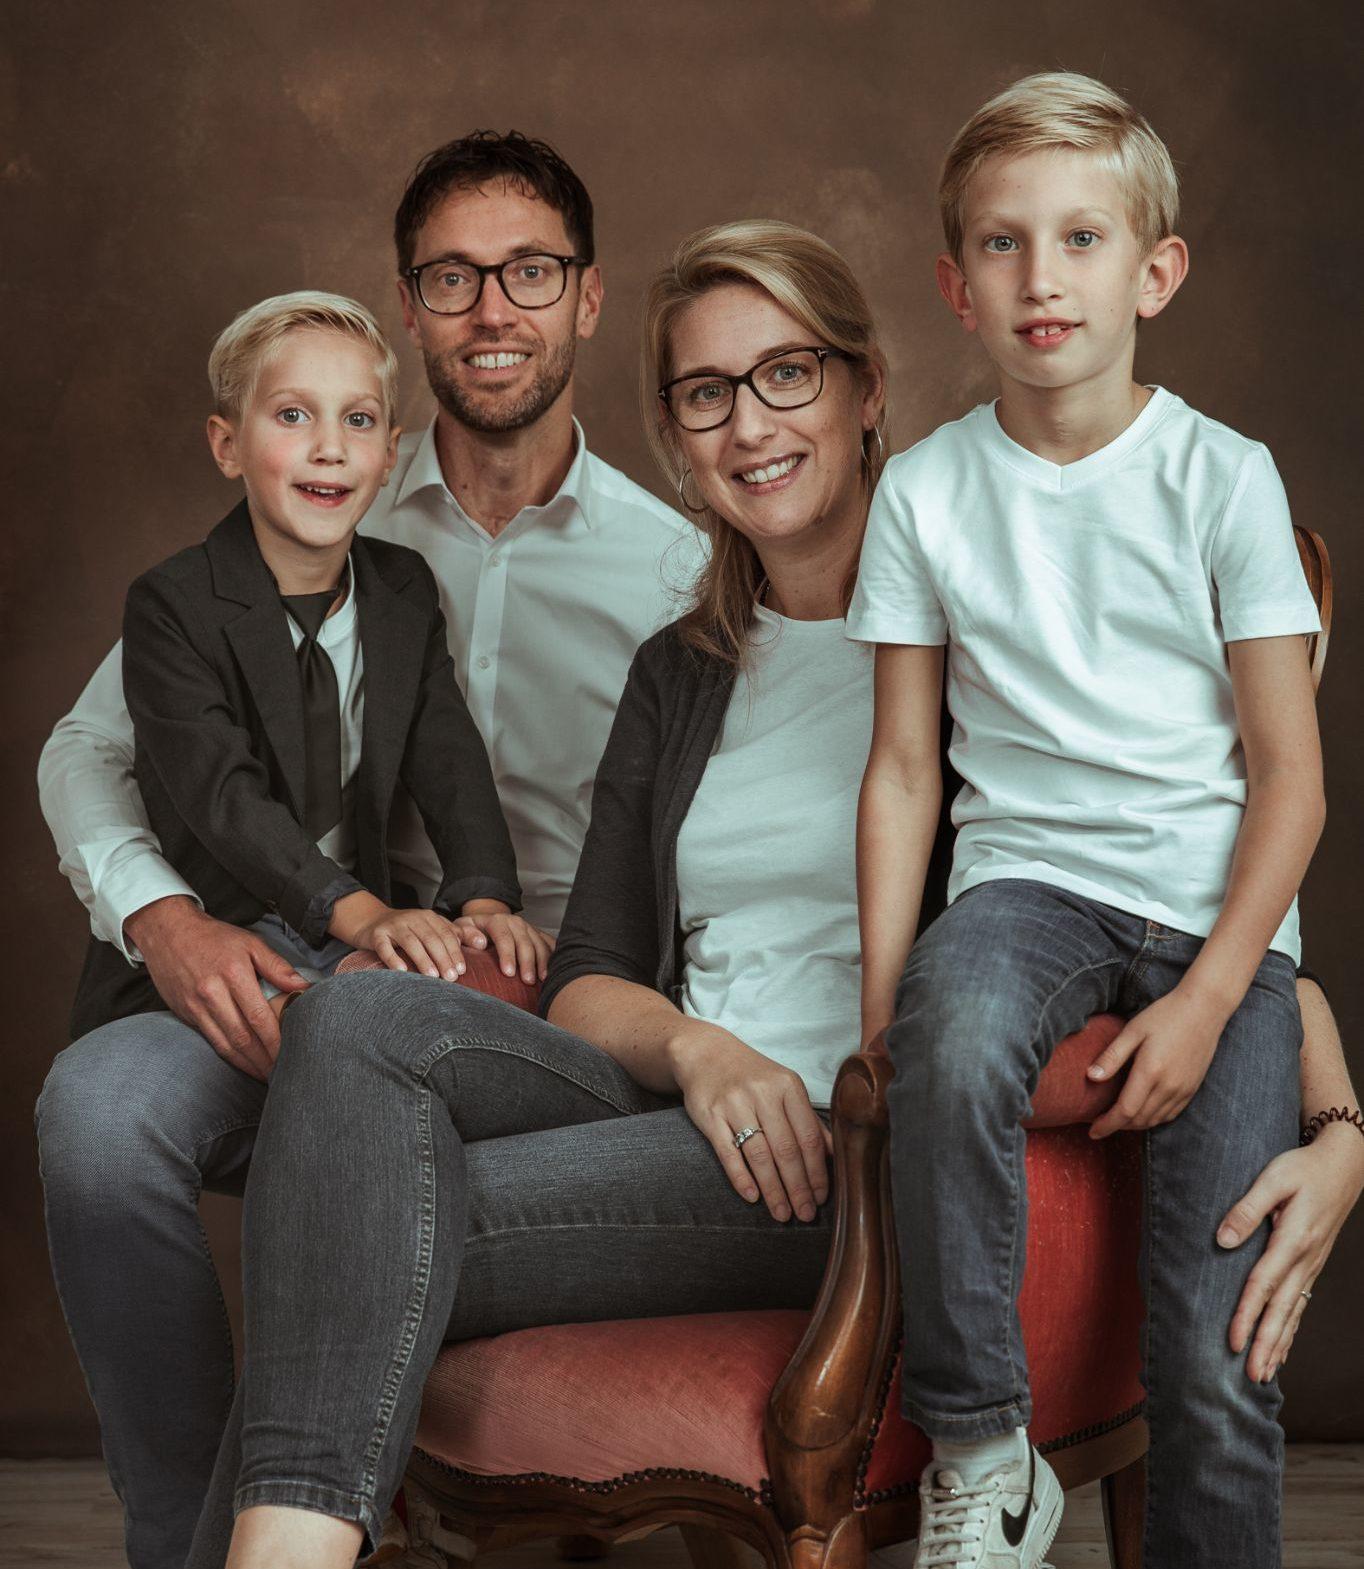 portfolio gezinsfotoshoots xifotografie